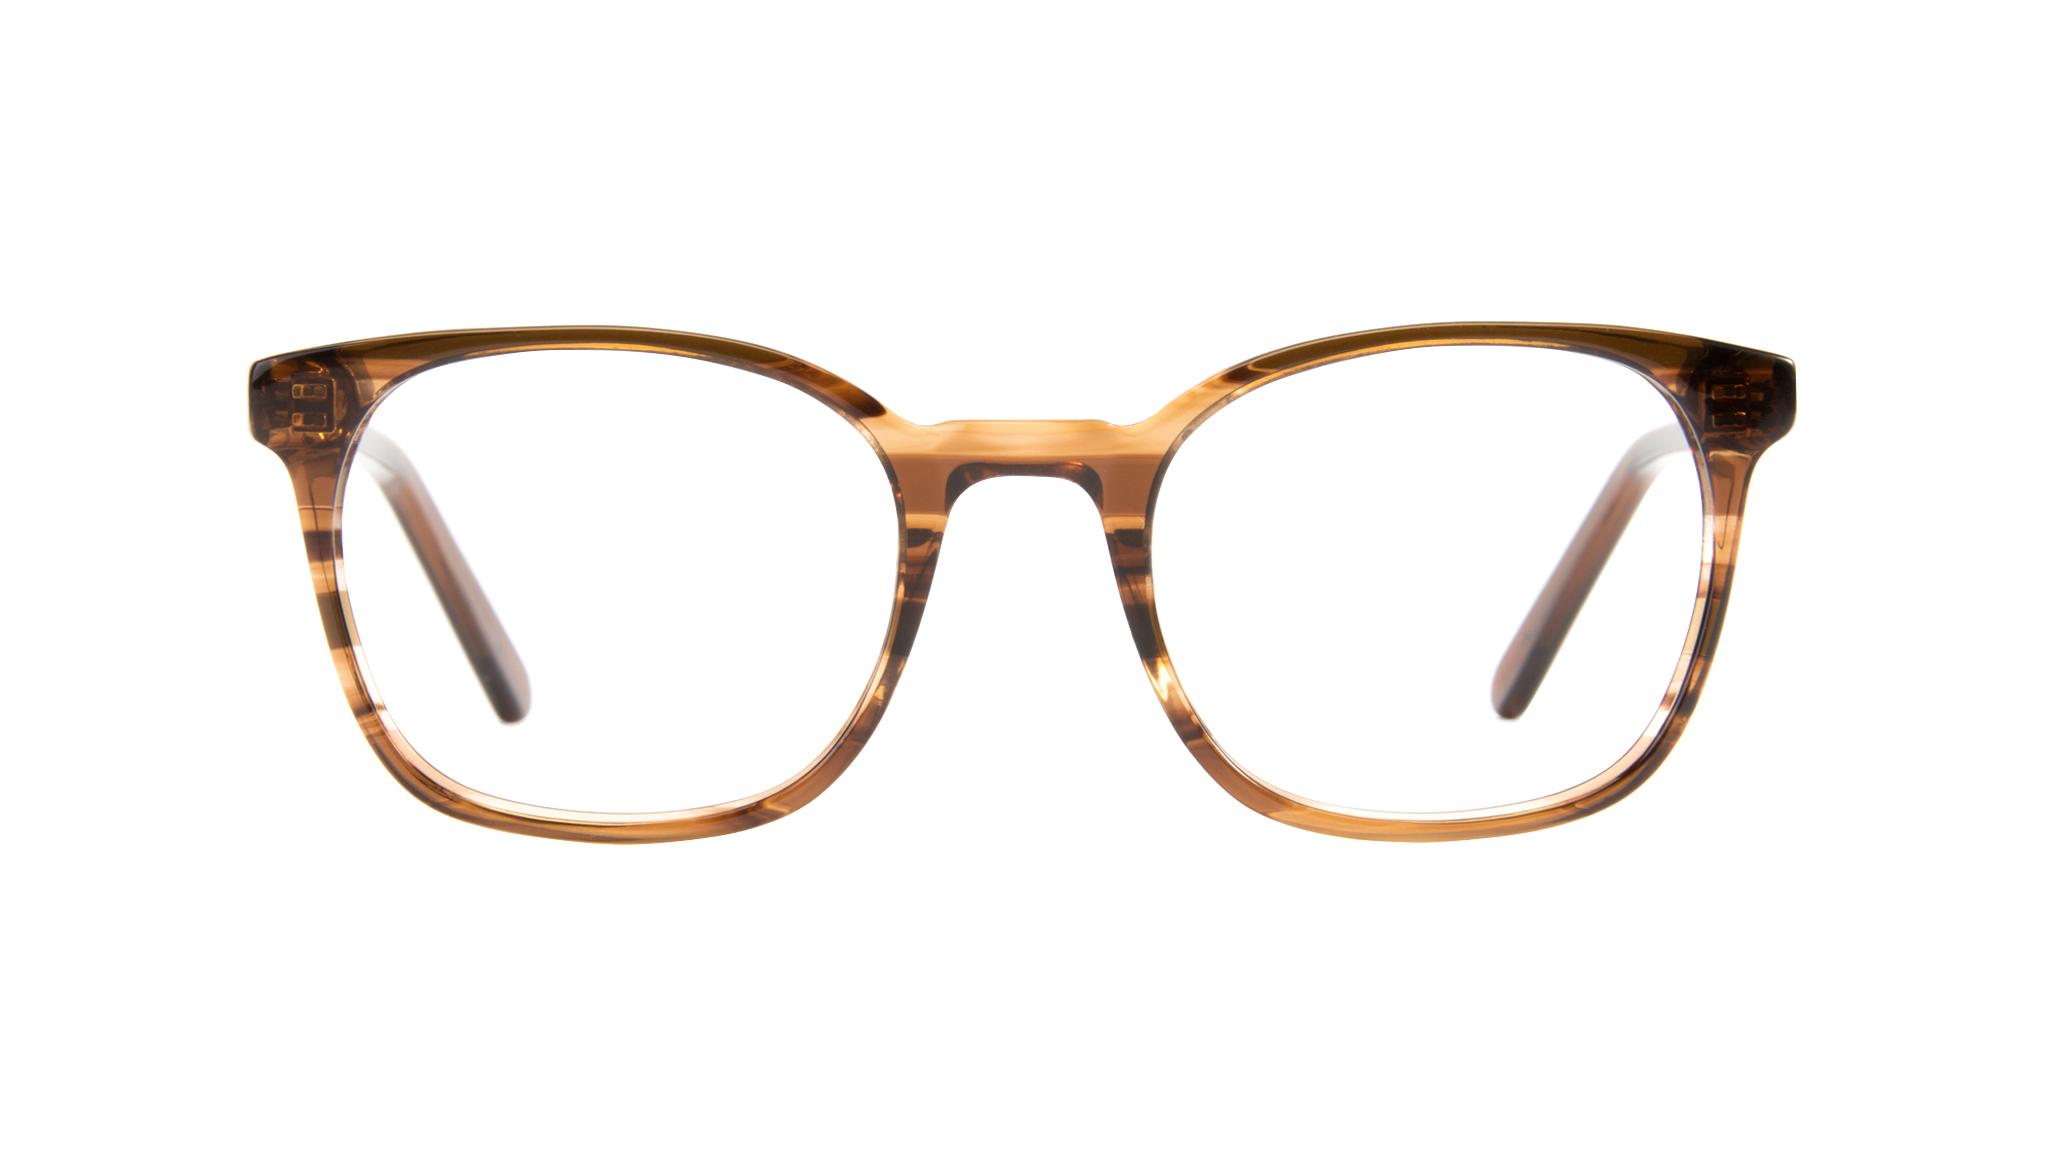 e08ec926ef Affordable fashion glasses rectangle square eyeglasses men peak wood front  jpg 1600x707 Glasses foe wood